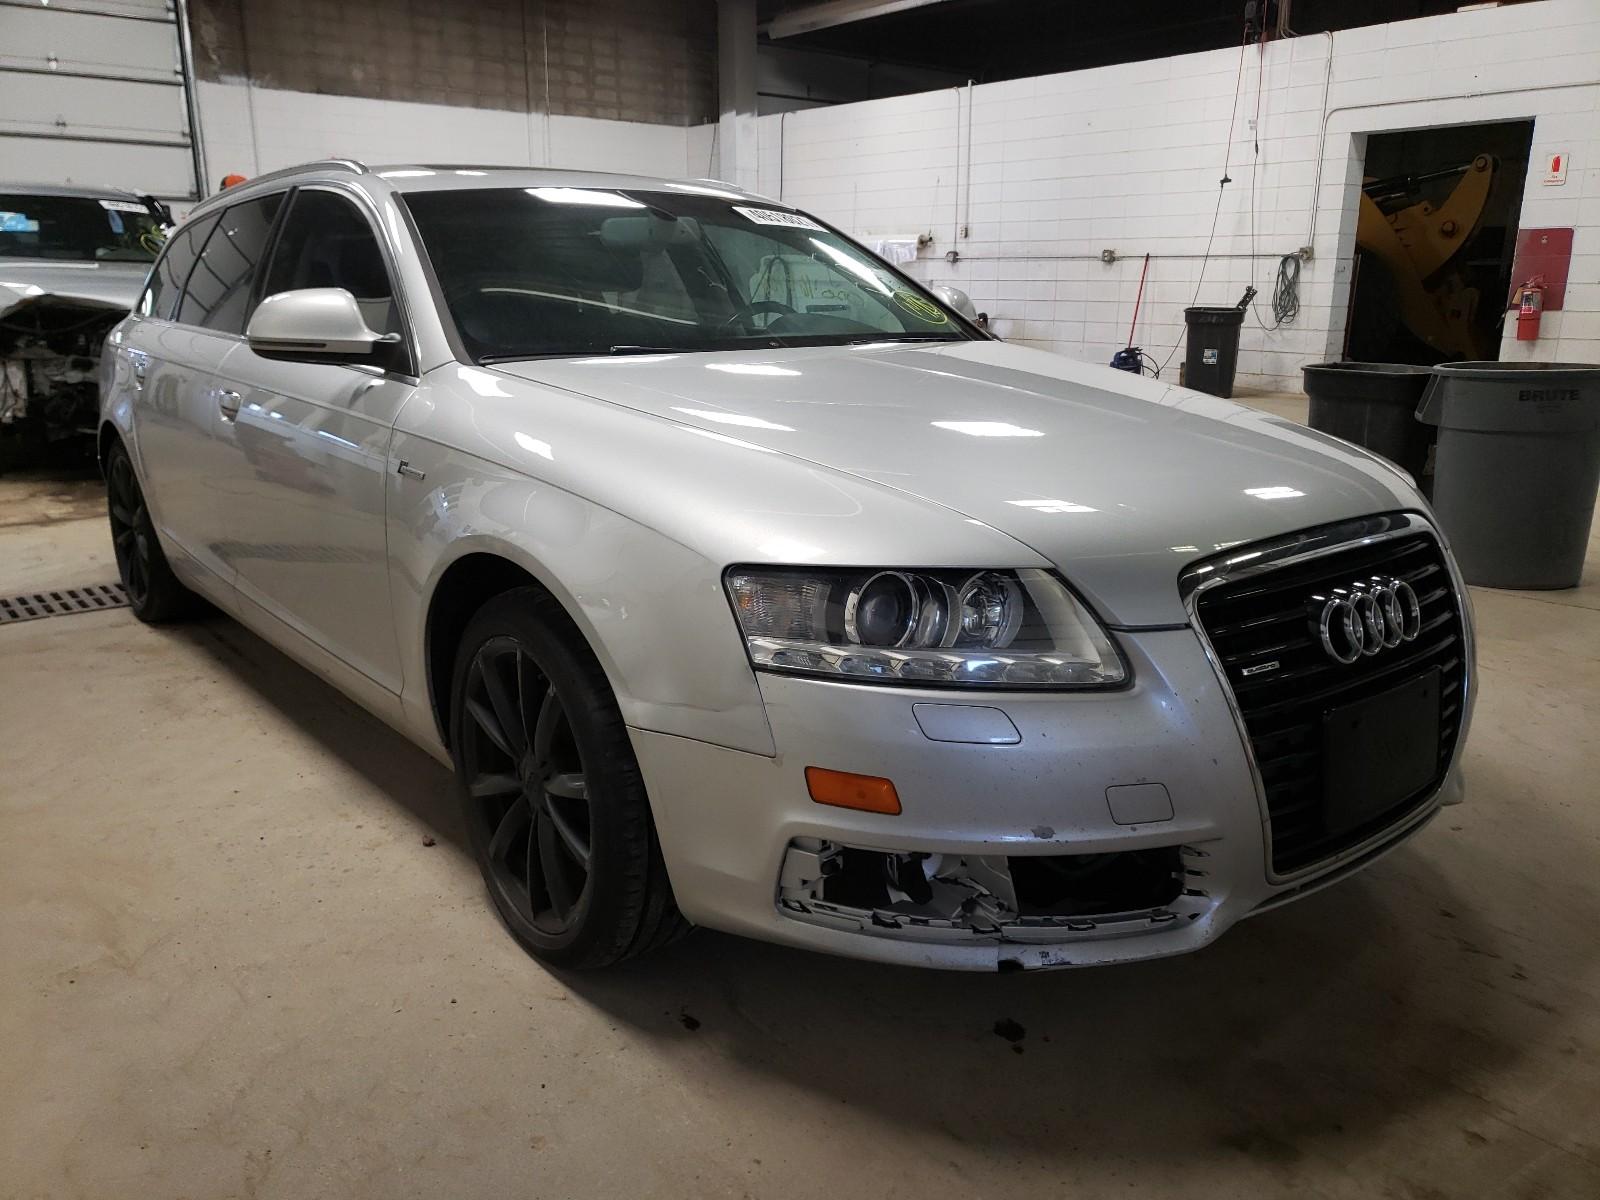 2010 Audi A6 Prestige